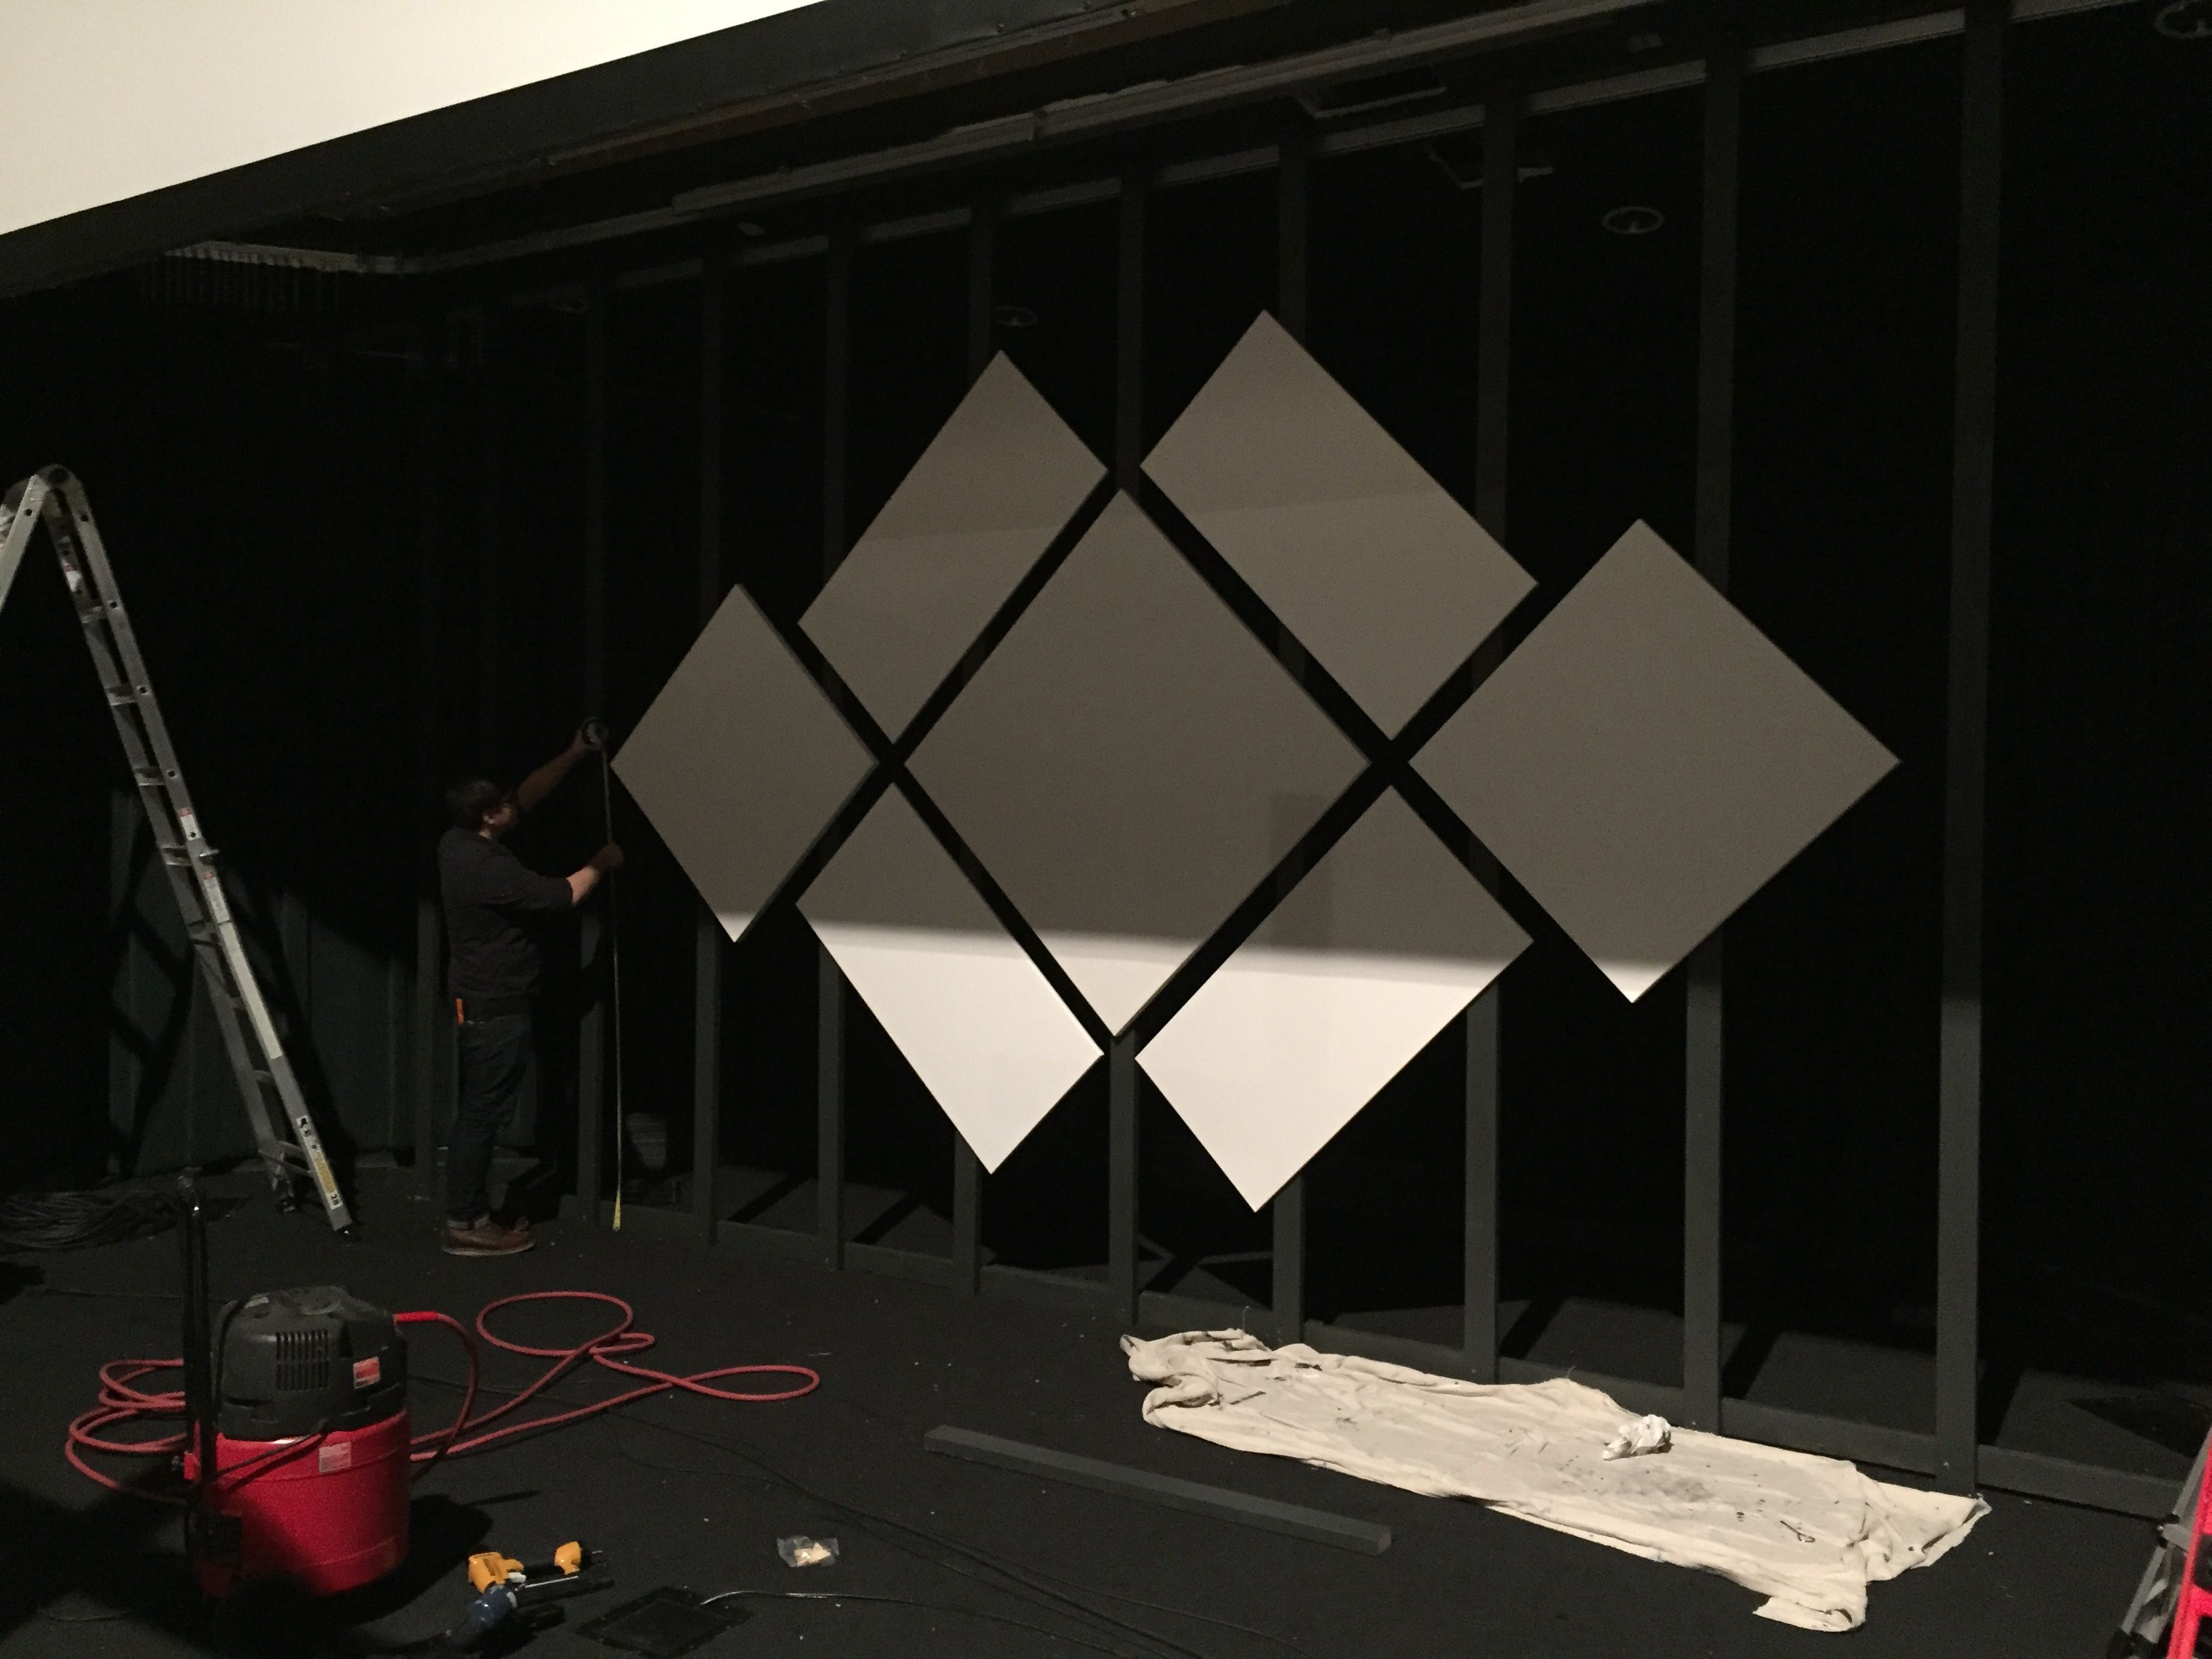 Diamond Projection Stage Backdrop Design Church Stage Design Stage Set Design